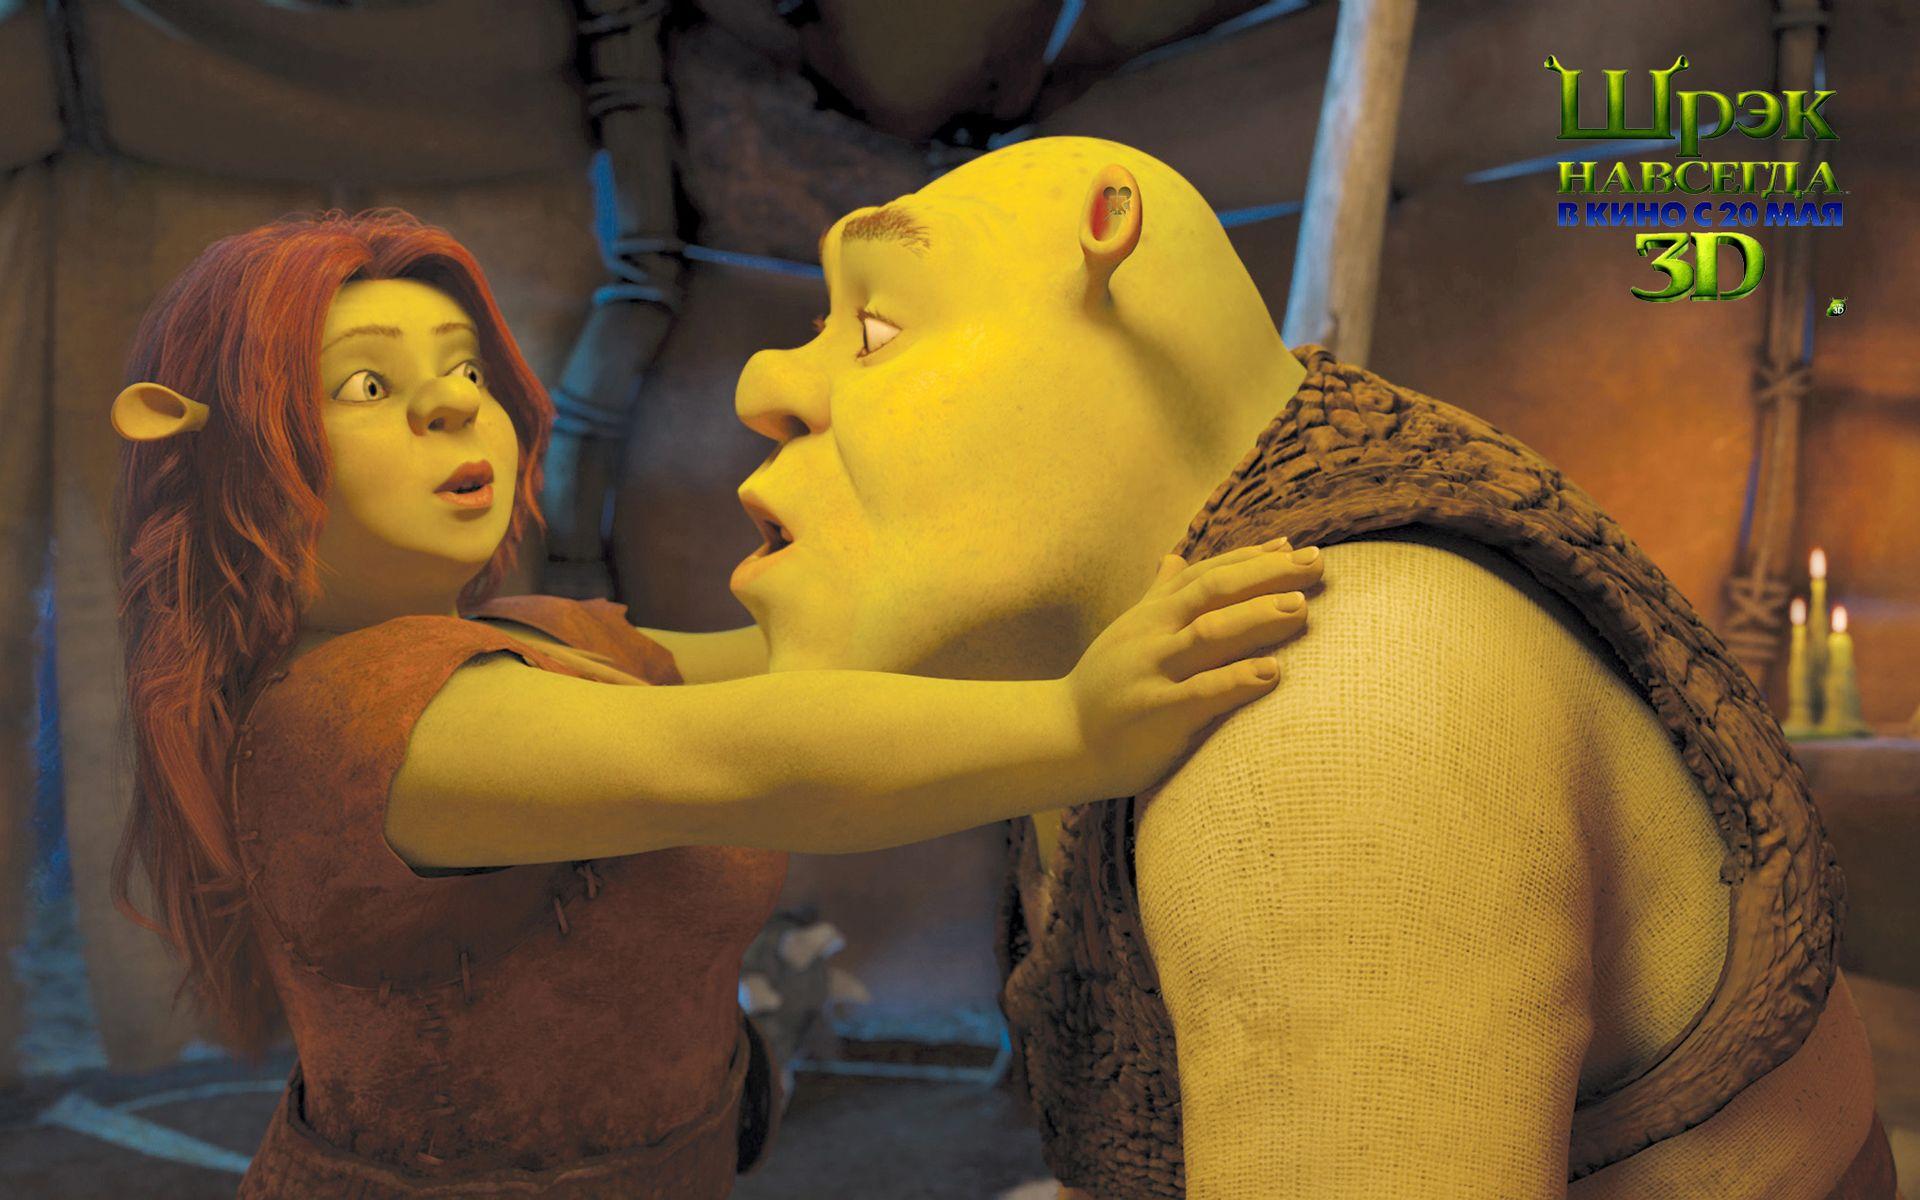 Shrek cartoon porn pics naked pic